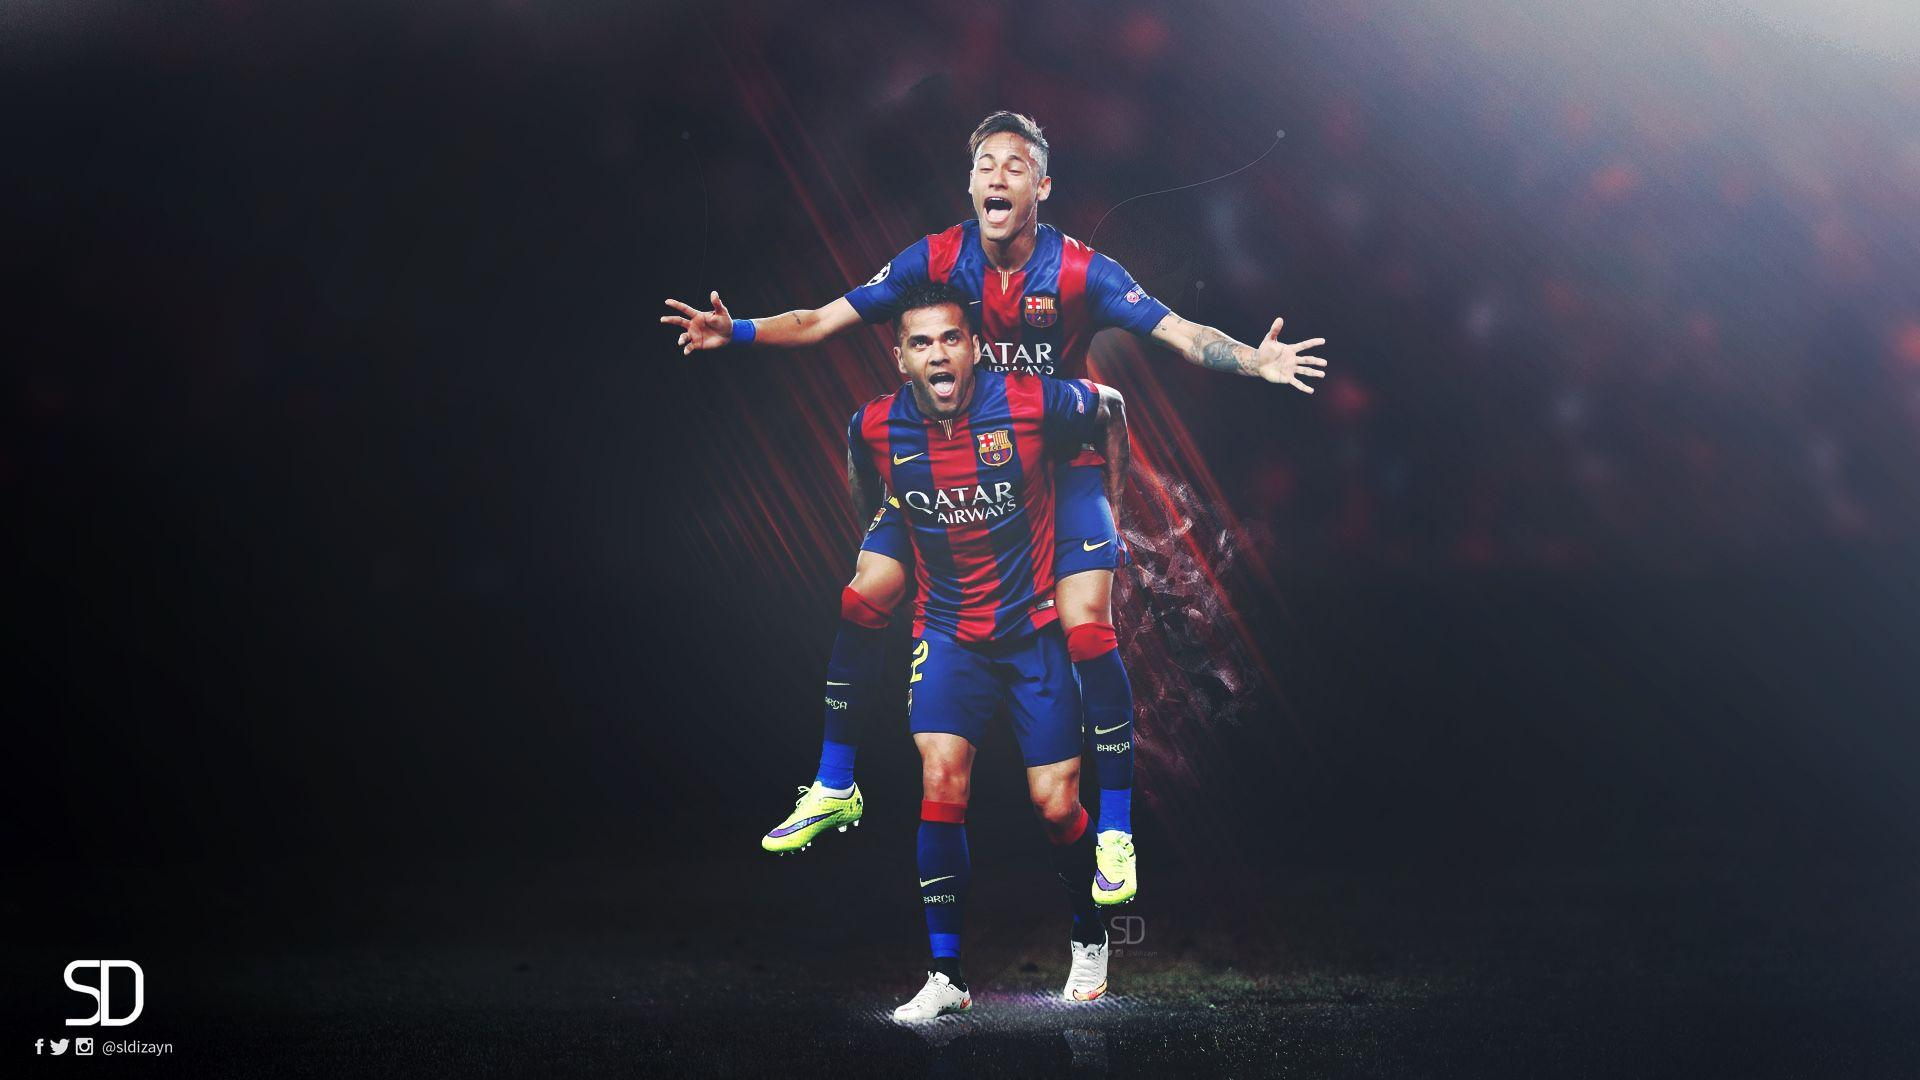 Neymar Barcelona Wallpapers 1920x1080